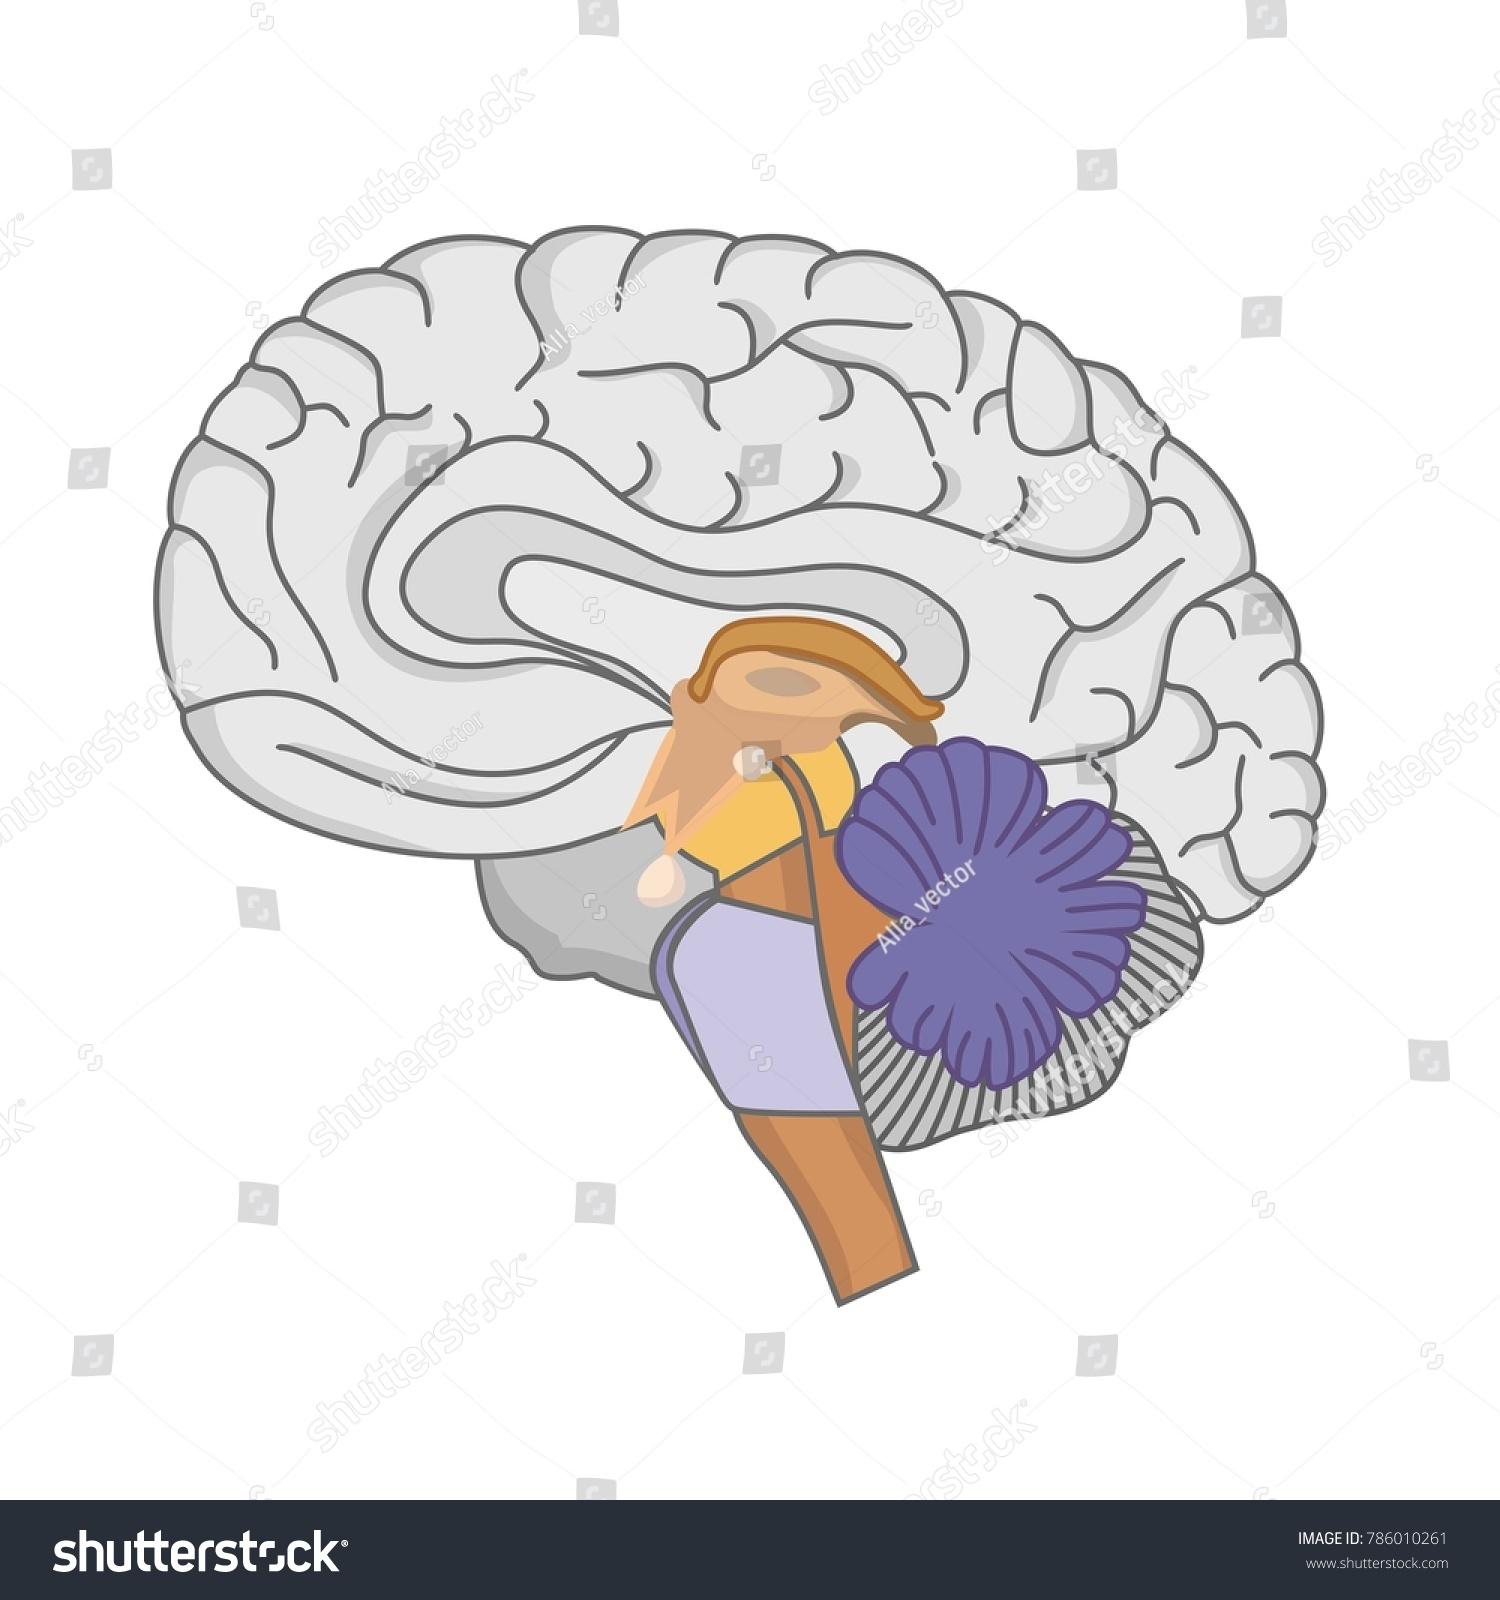 Human Brain Anatomy Human Brain On Stock Vektorgrafik Lizenzfrei